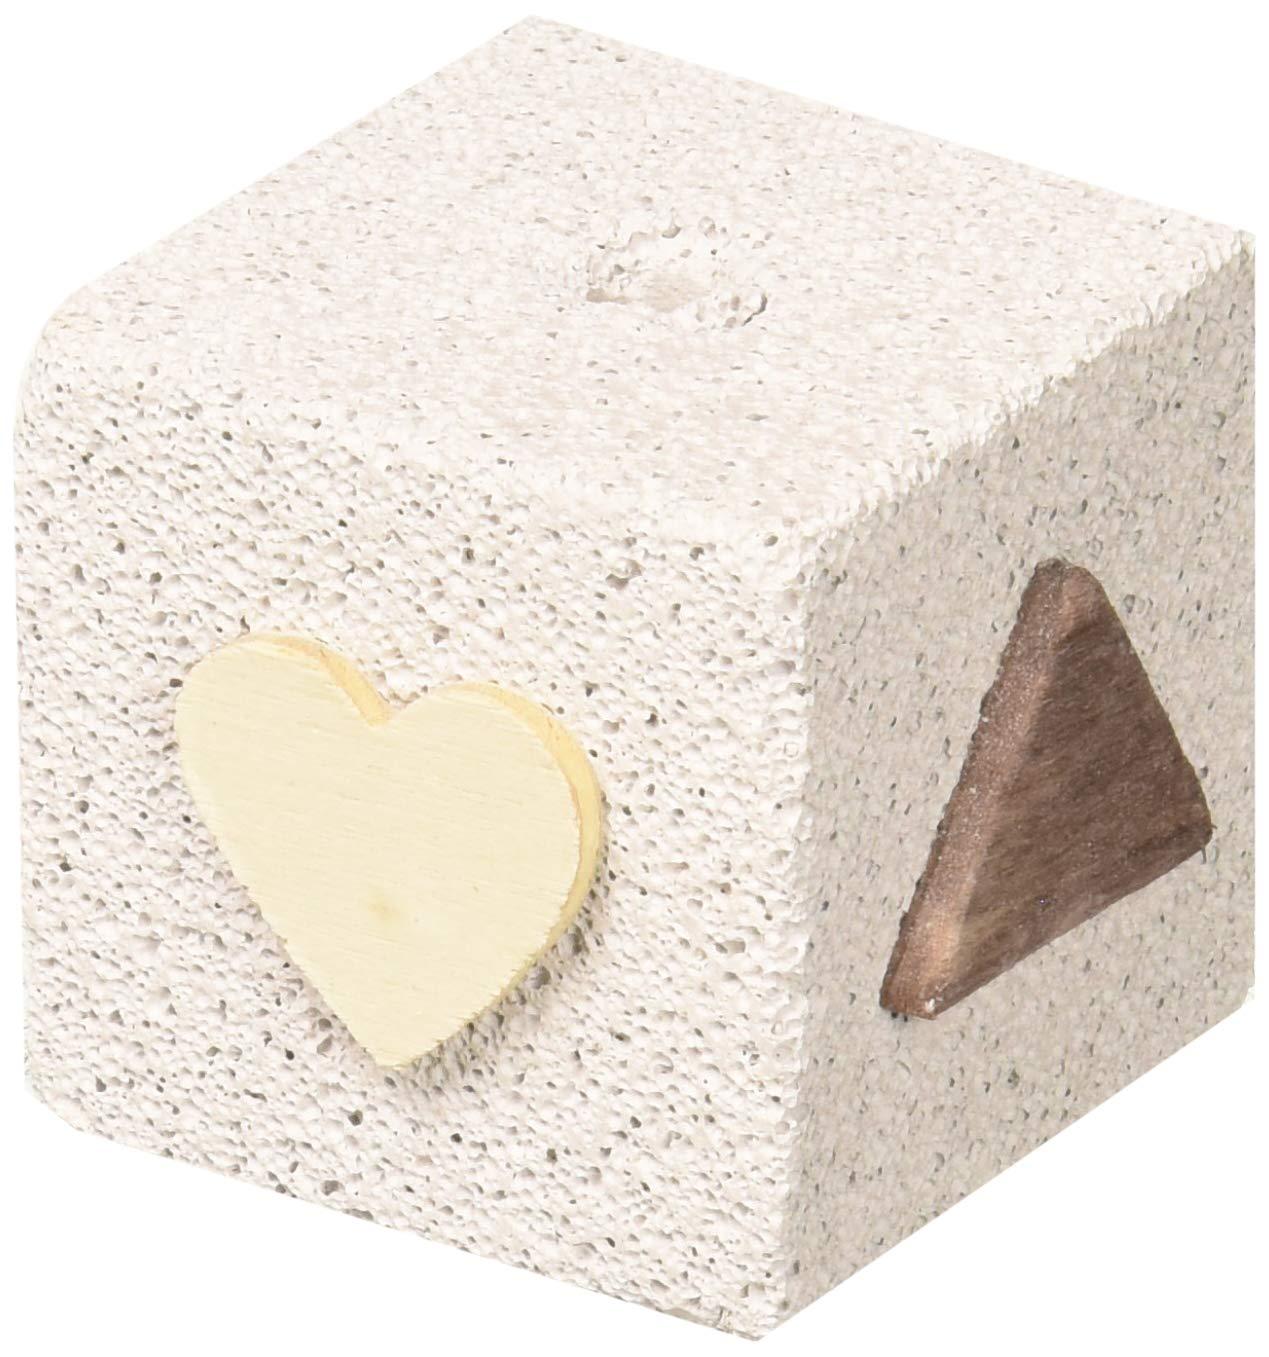 Kaytee Lava Block with Wood Chews, 4 pack